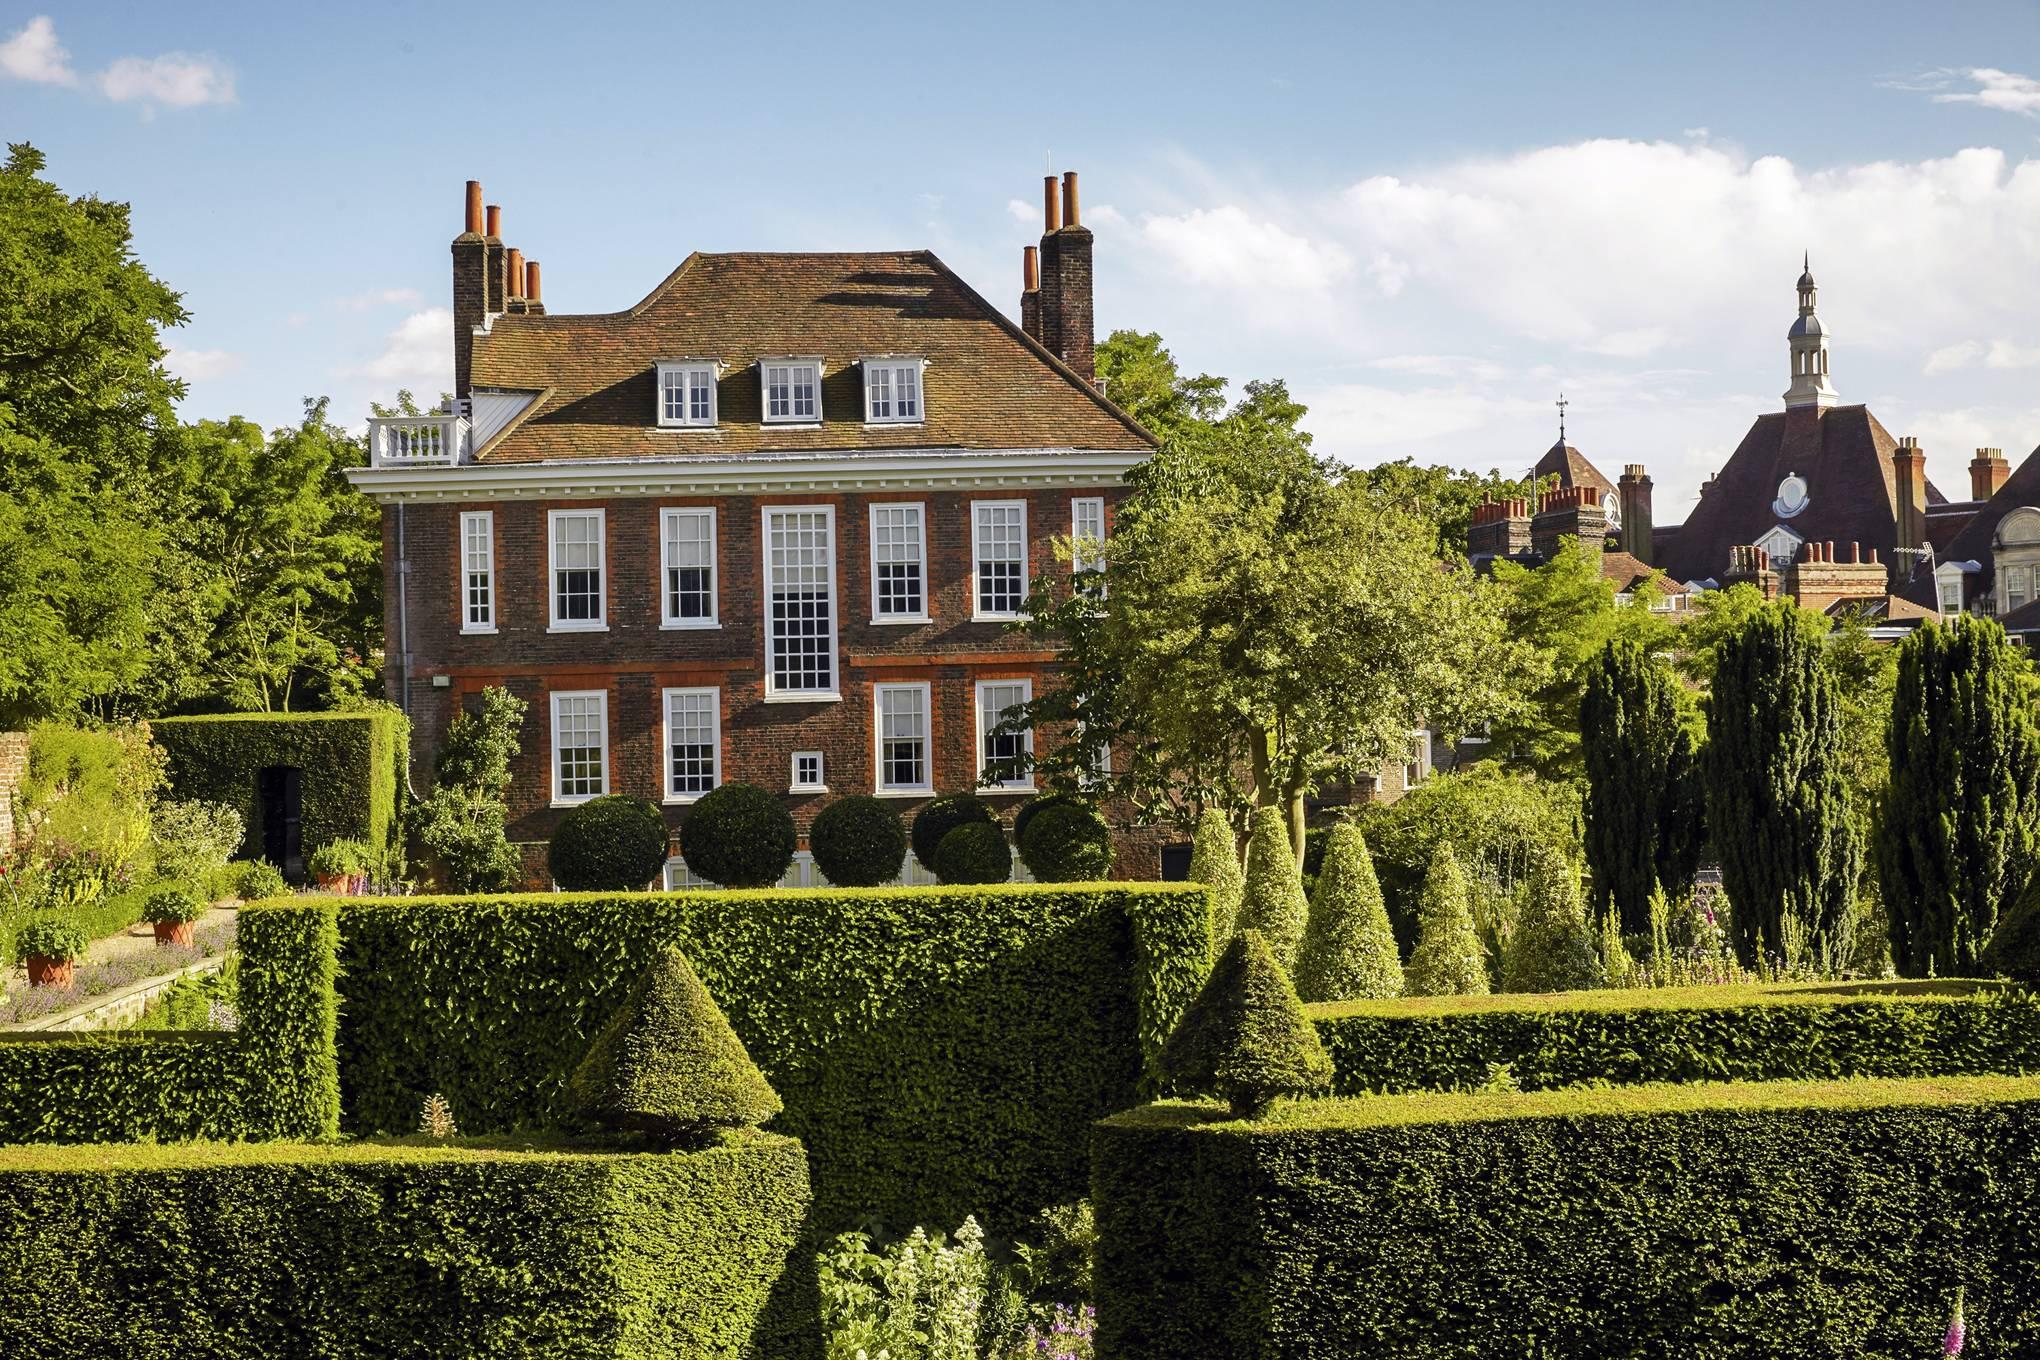 10 little-known National Trust properties in London